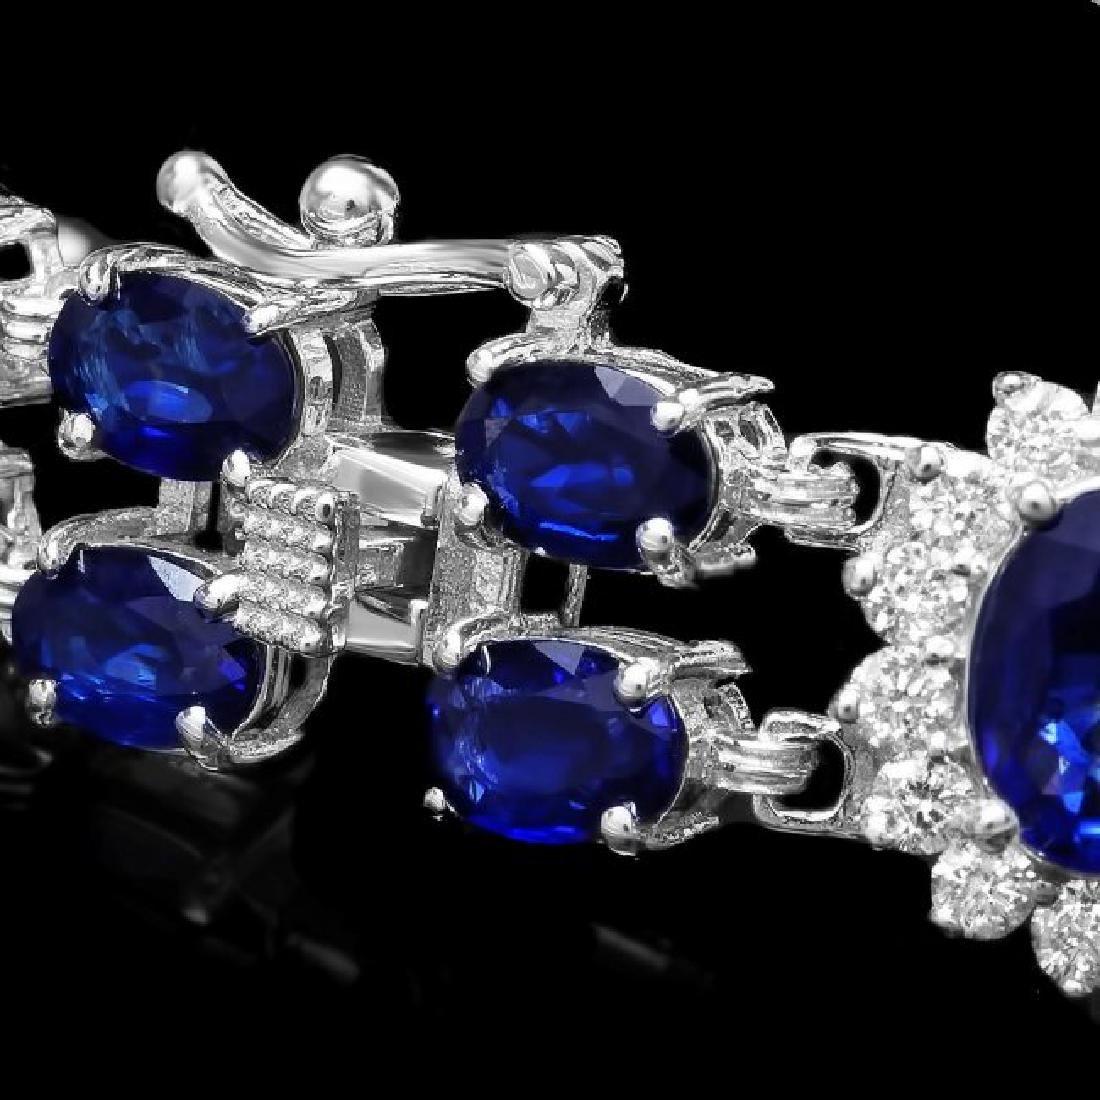 14k Gold 23.00ct Sapphire 1.50ct Diamond Bracelet - 3